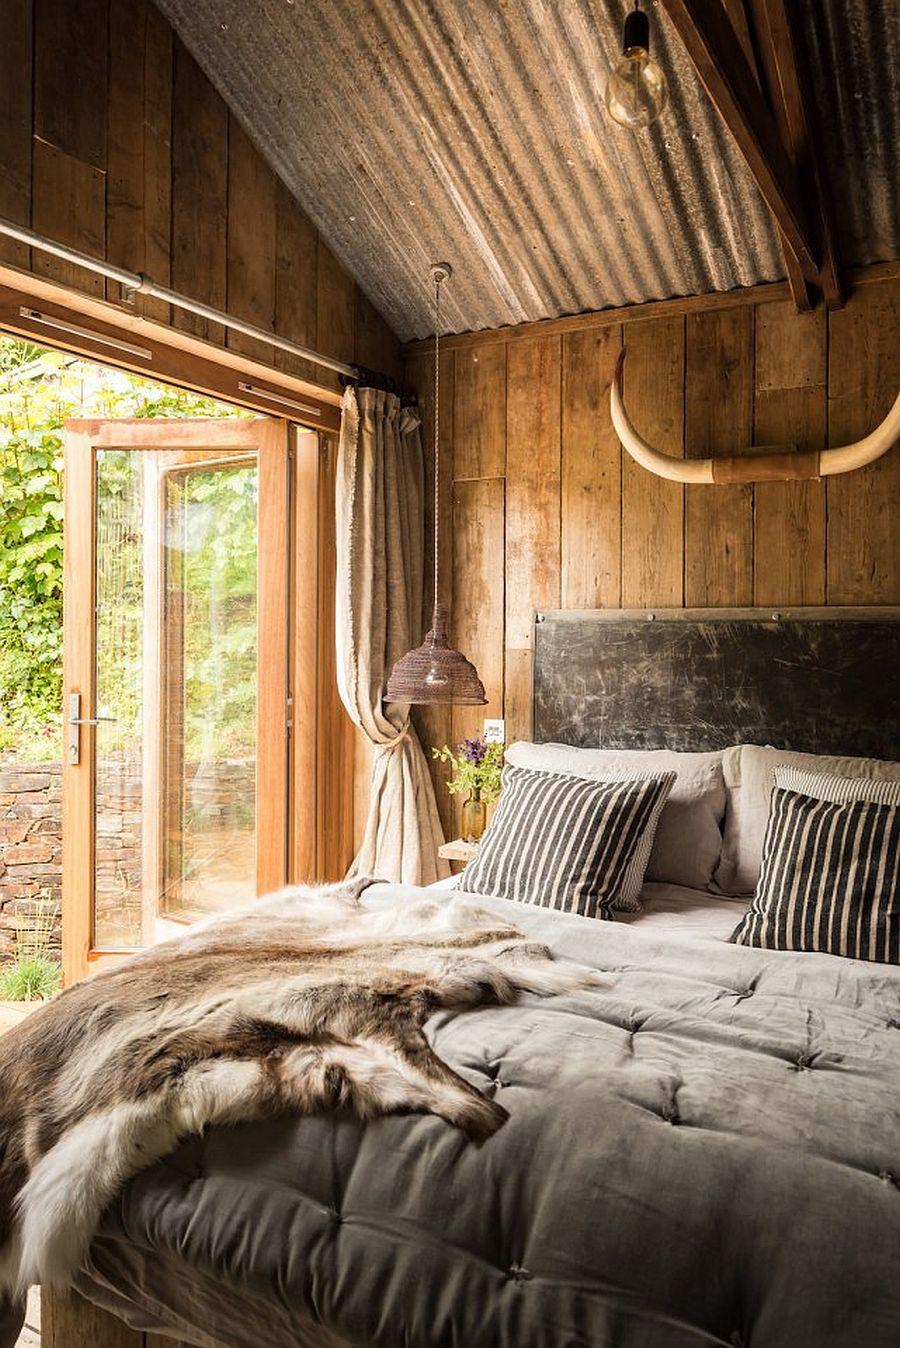 adelaparvu.com despre cabana rustica si tuse industriale, Firefly Cabin, Cornwall, Anglia, Foto Unique Home Stays (4)